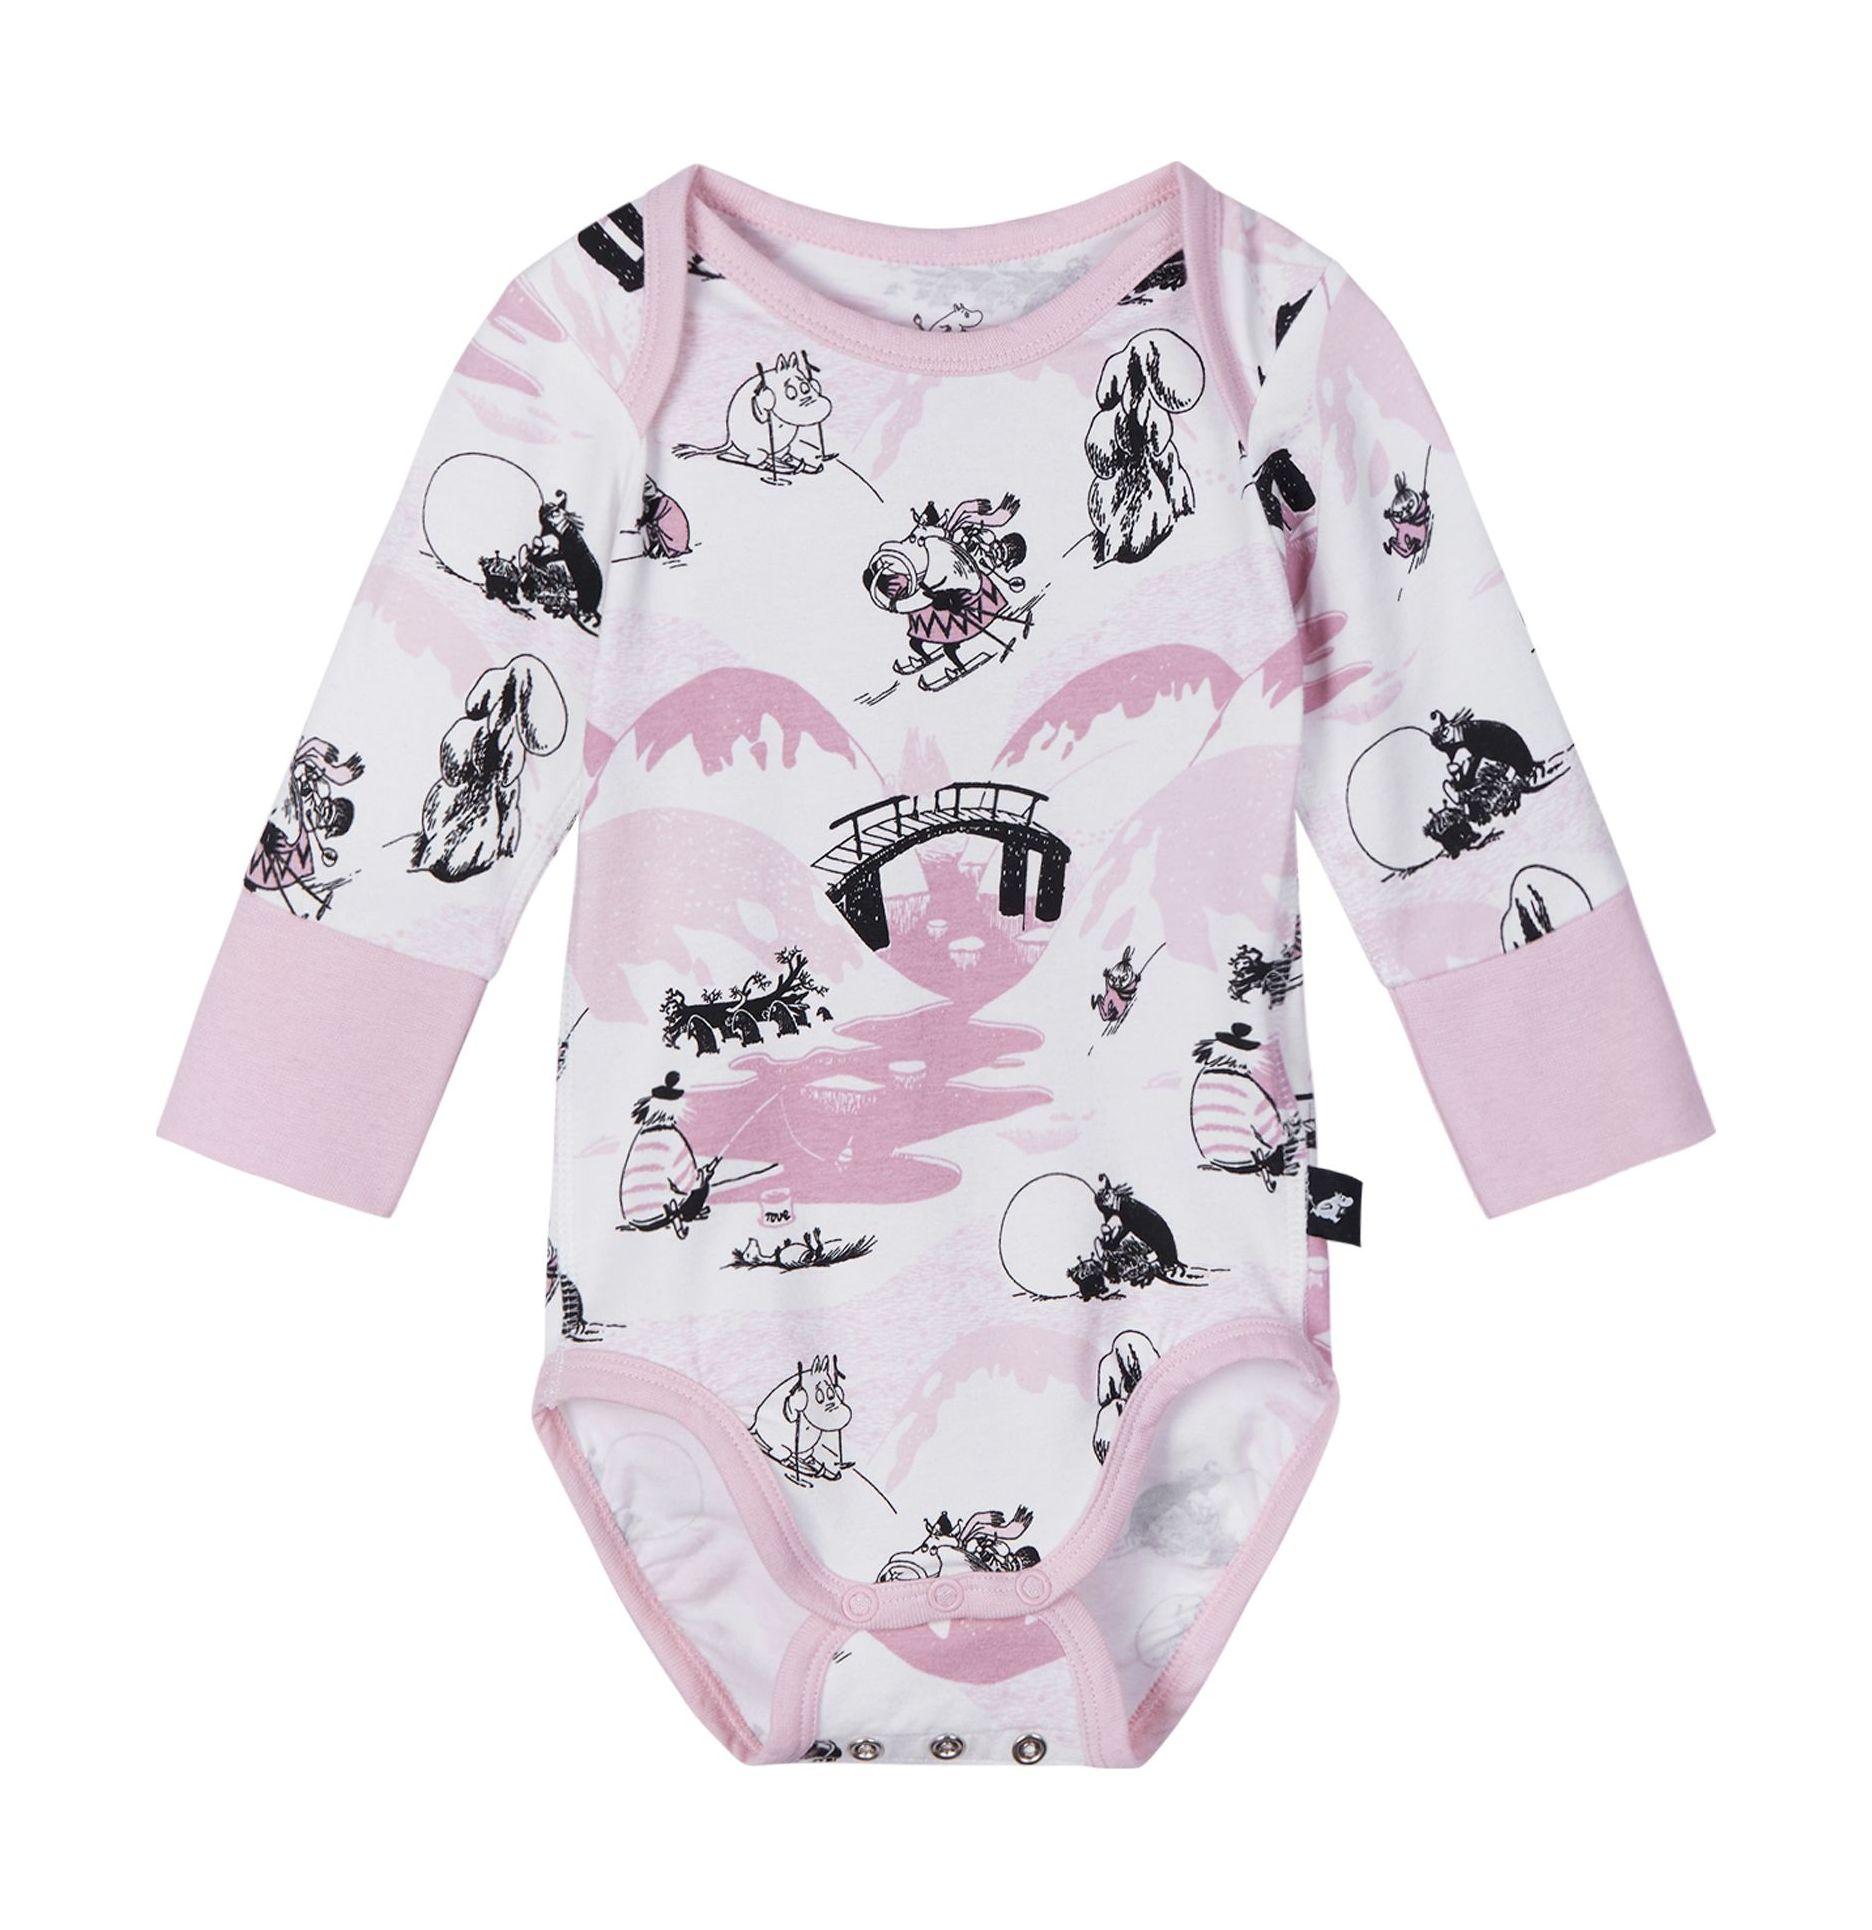 REIMA Moomin Snyggast Blush Pink 56-62